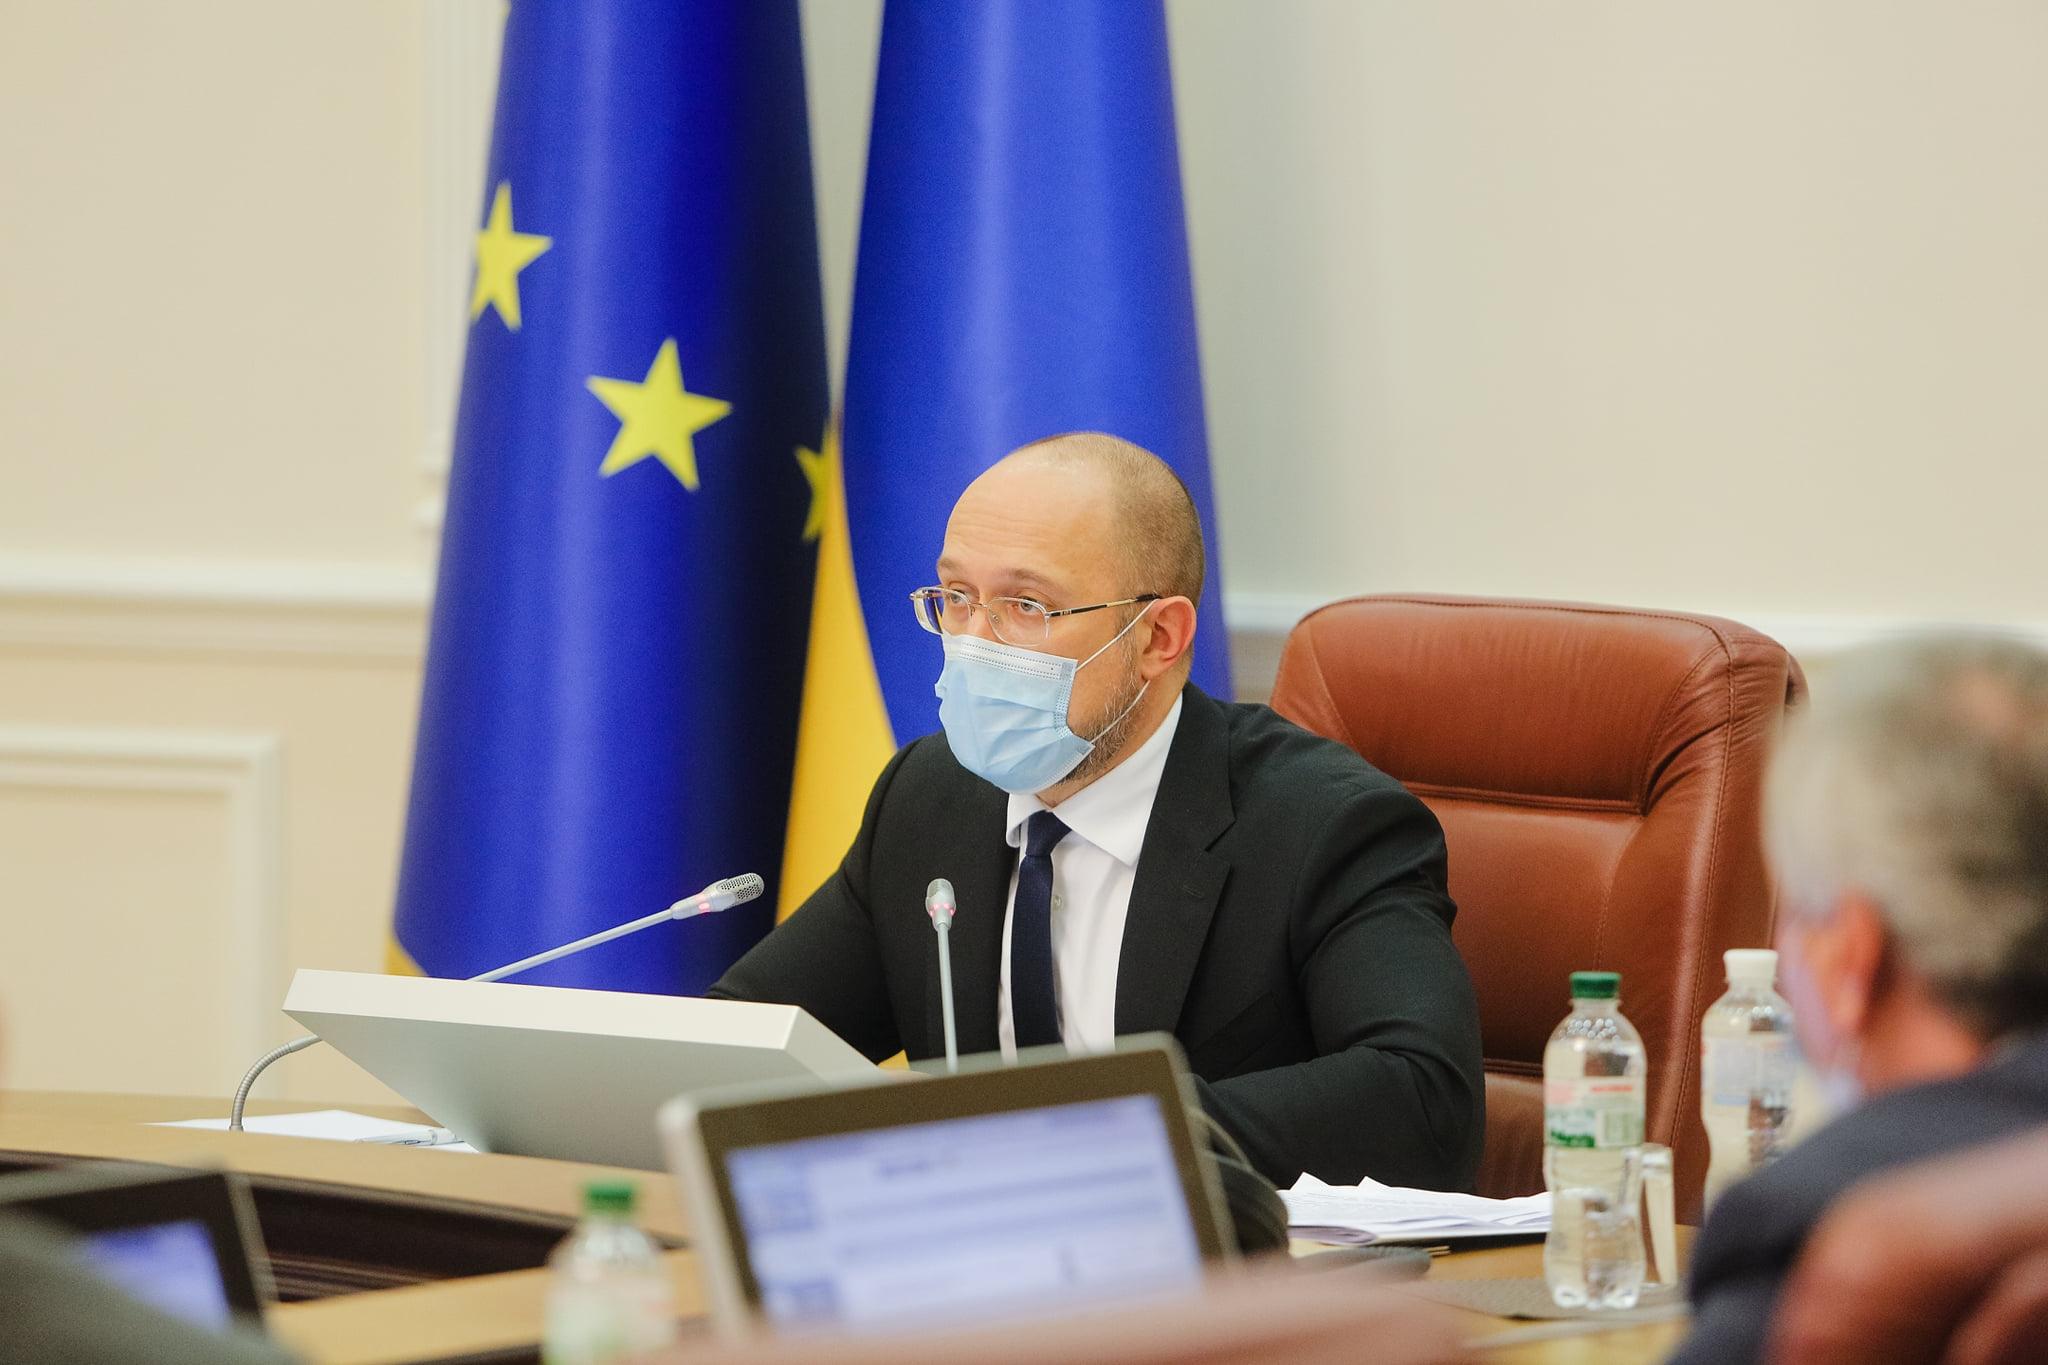 карантин в украине до конца года